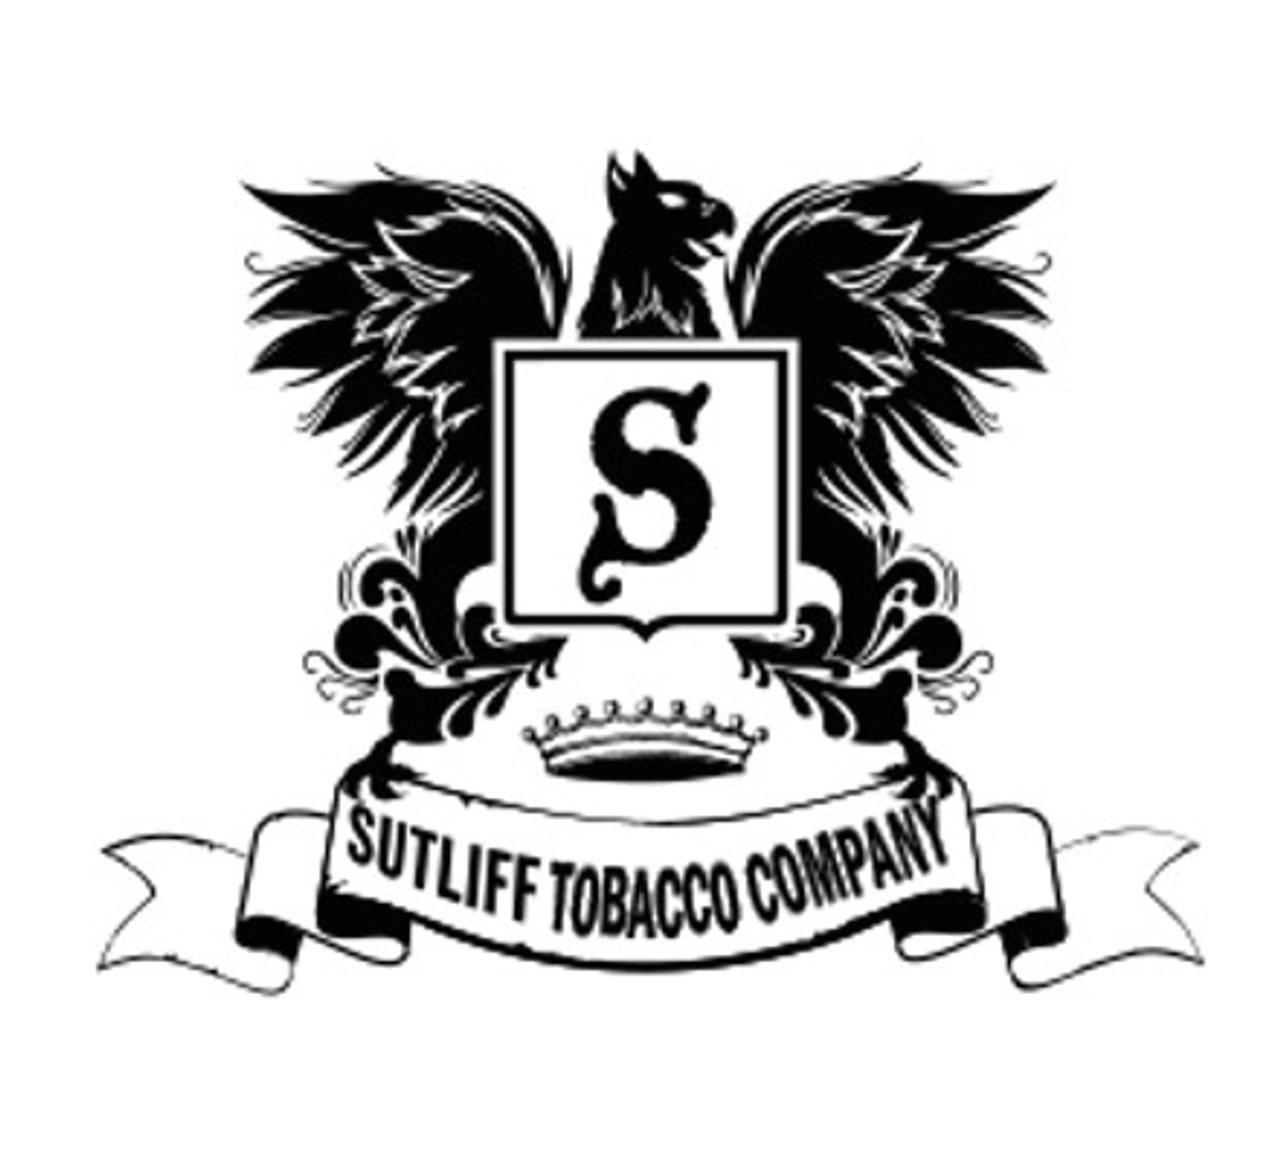 Sutliff 600 USA Blend Bulk Pipe Tobacco 5 LB